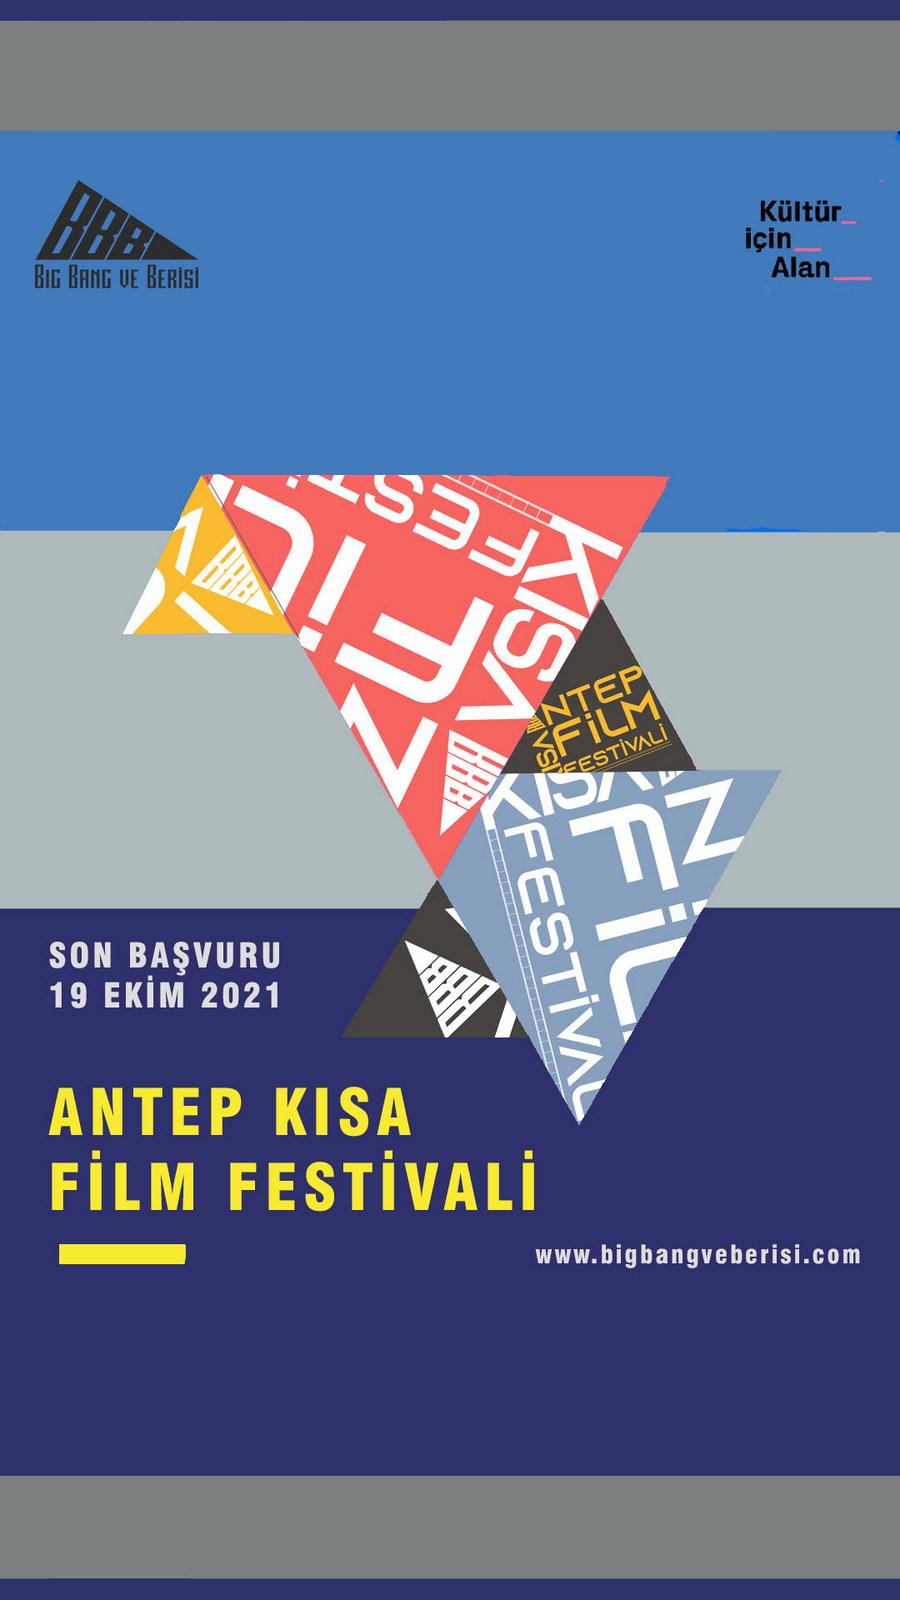 Antep Kısa Film Festivali.jpg